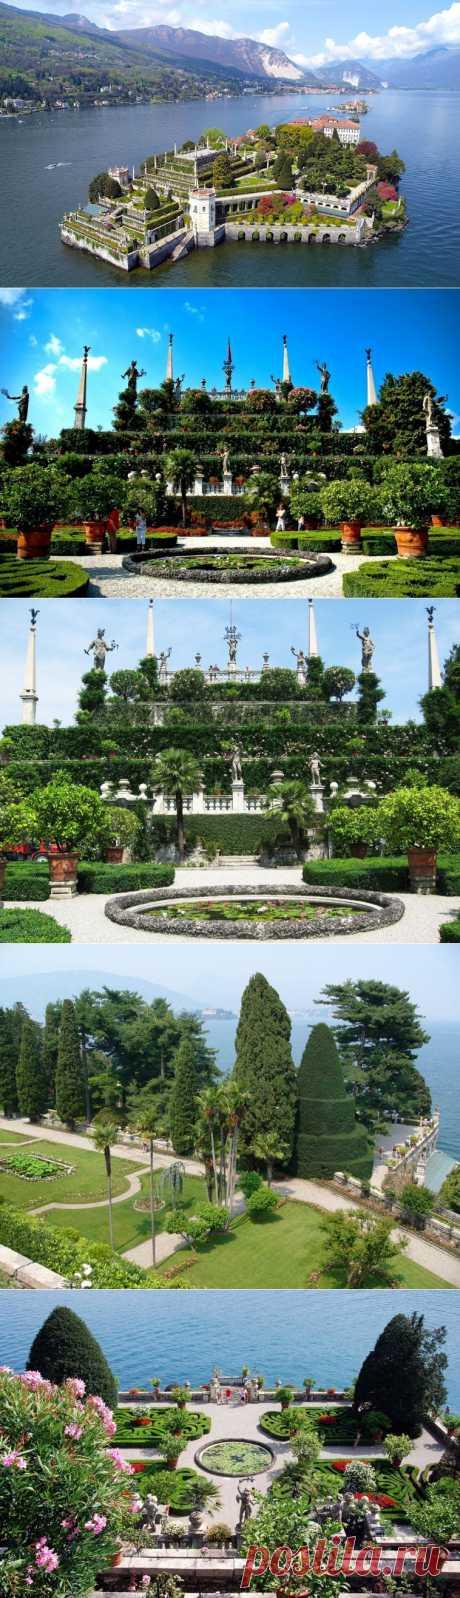 masterok: Сады острова Белла (Isola Bella)